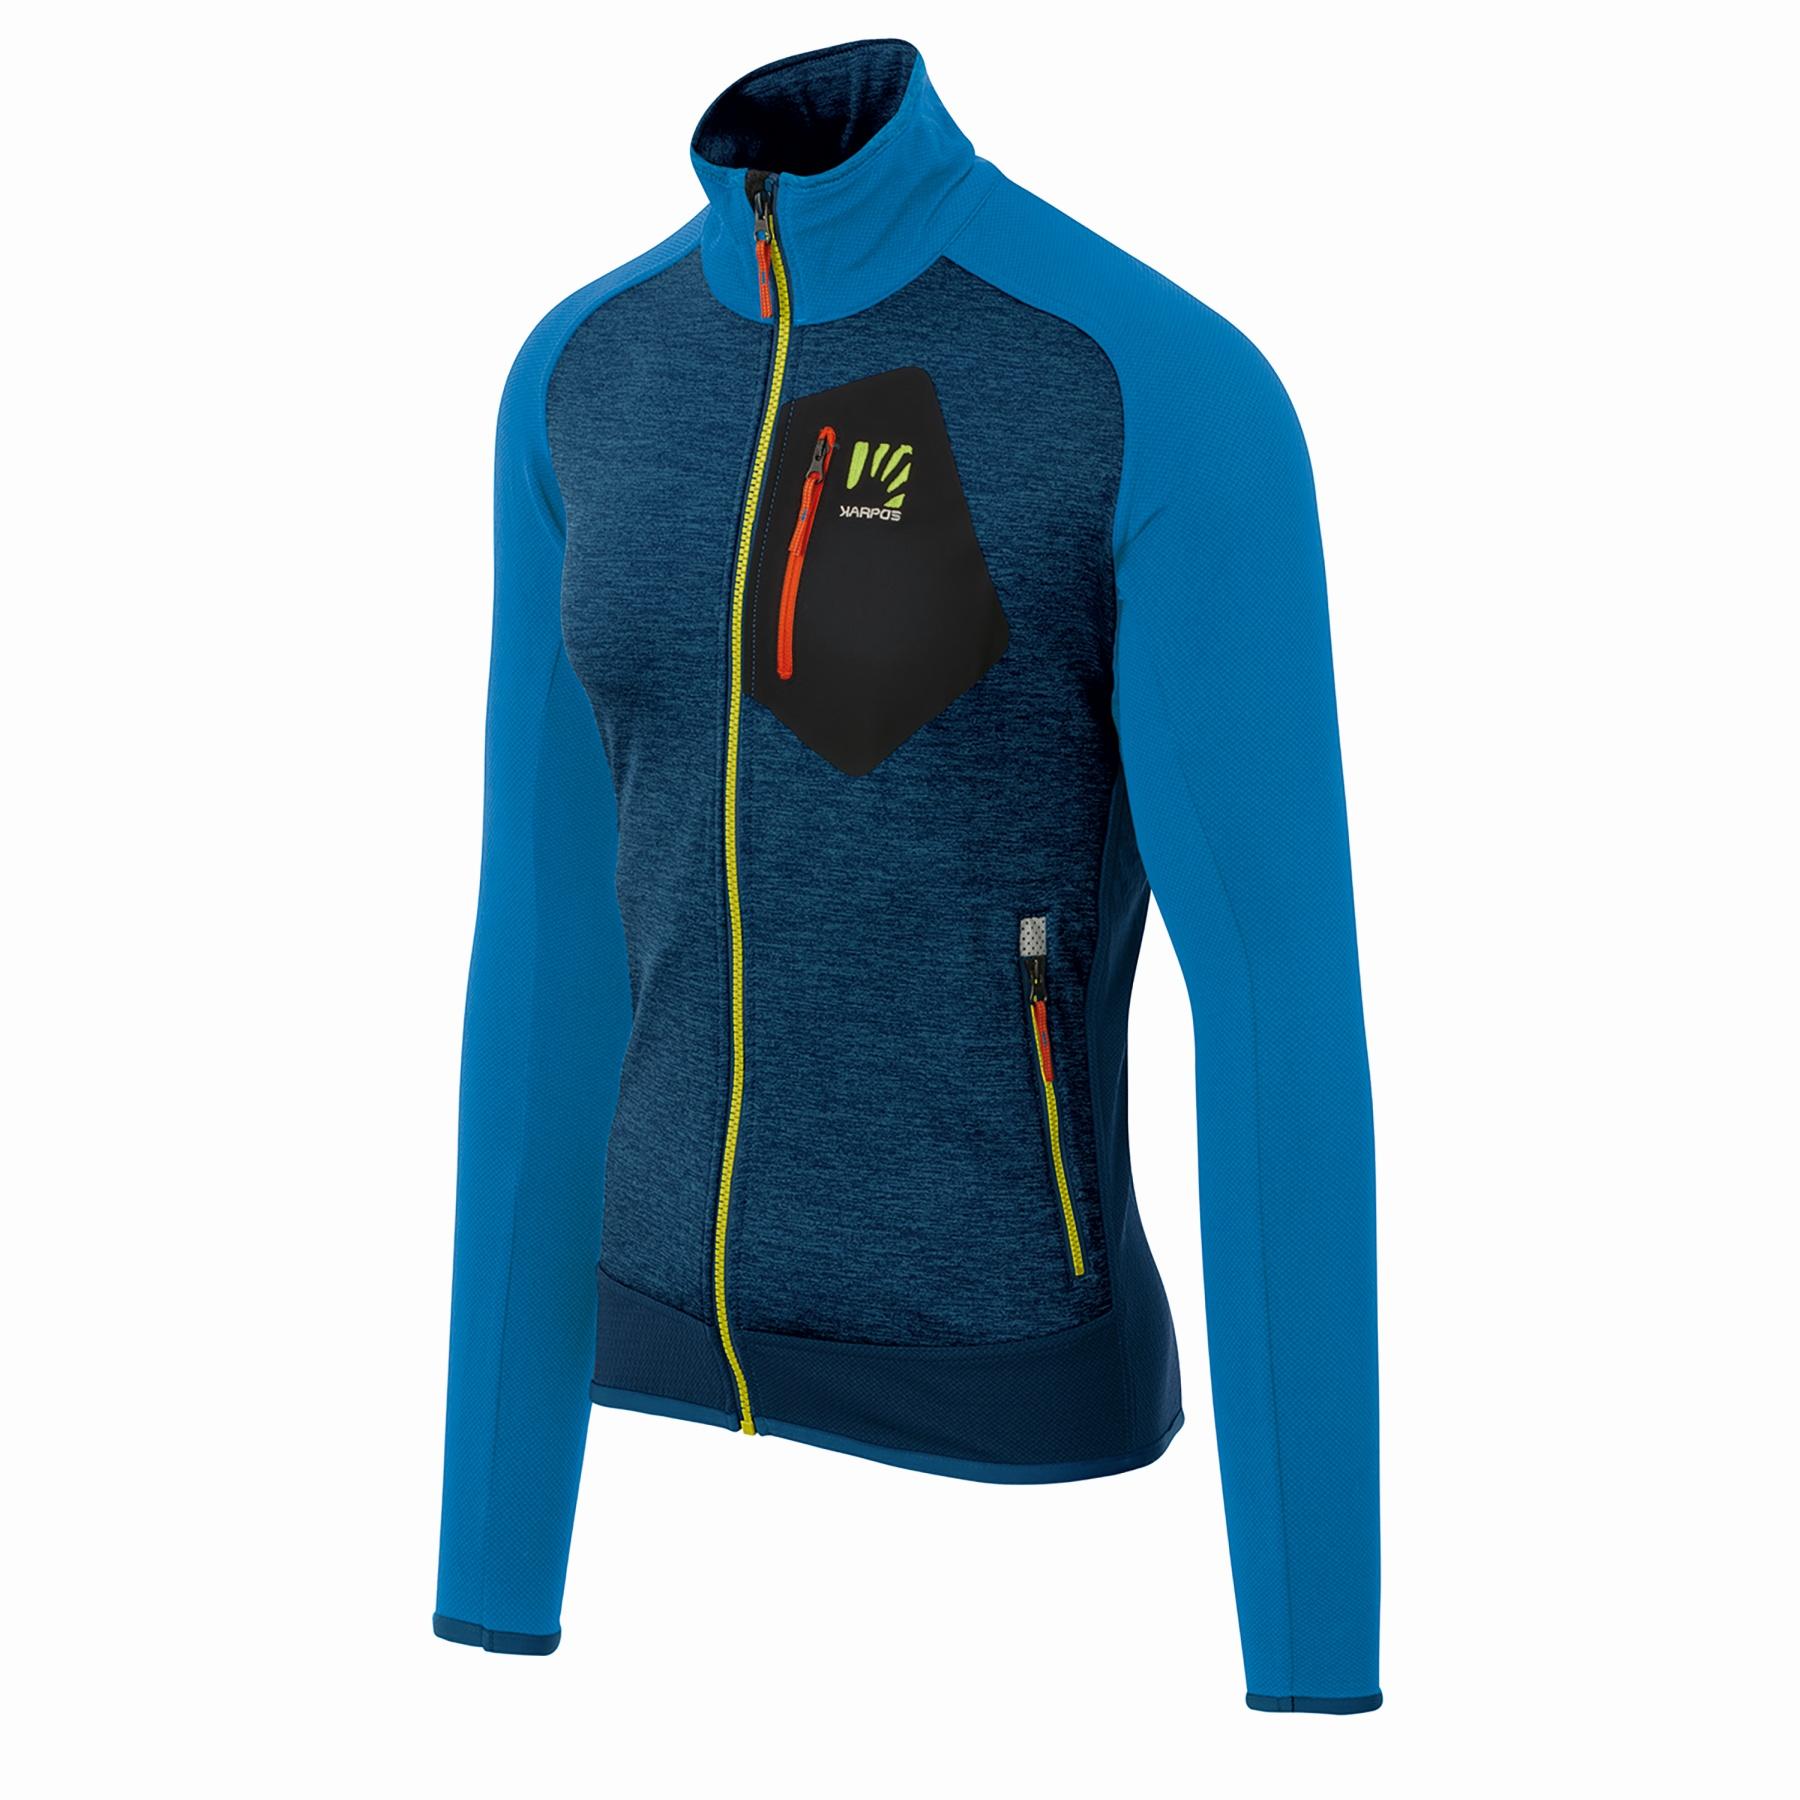 Karpos Odle Fleece Jacket - indigo bunting/insignia blue